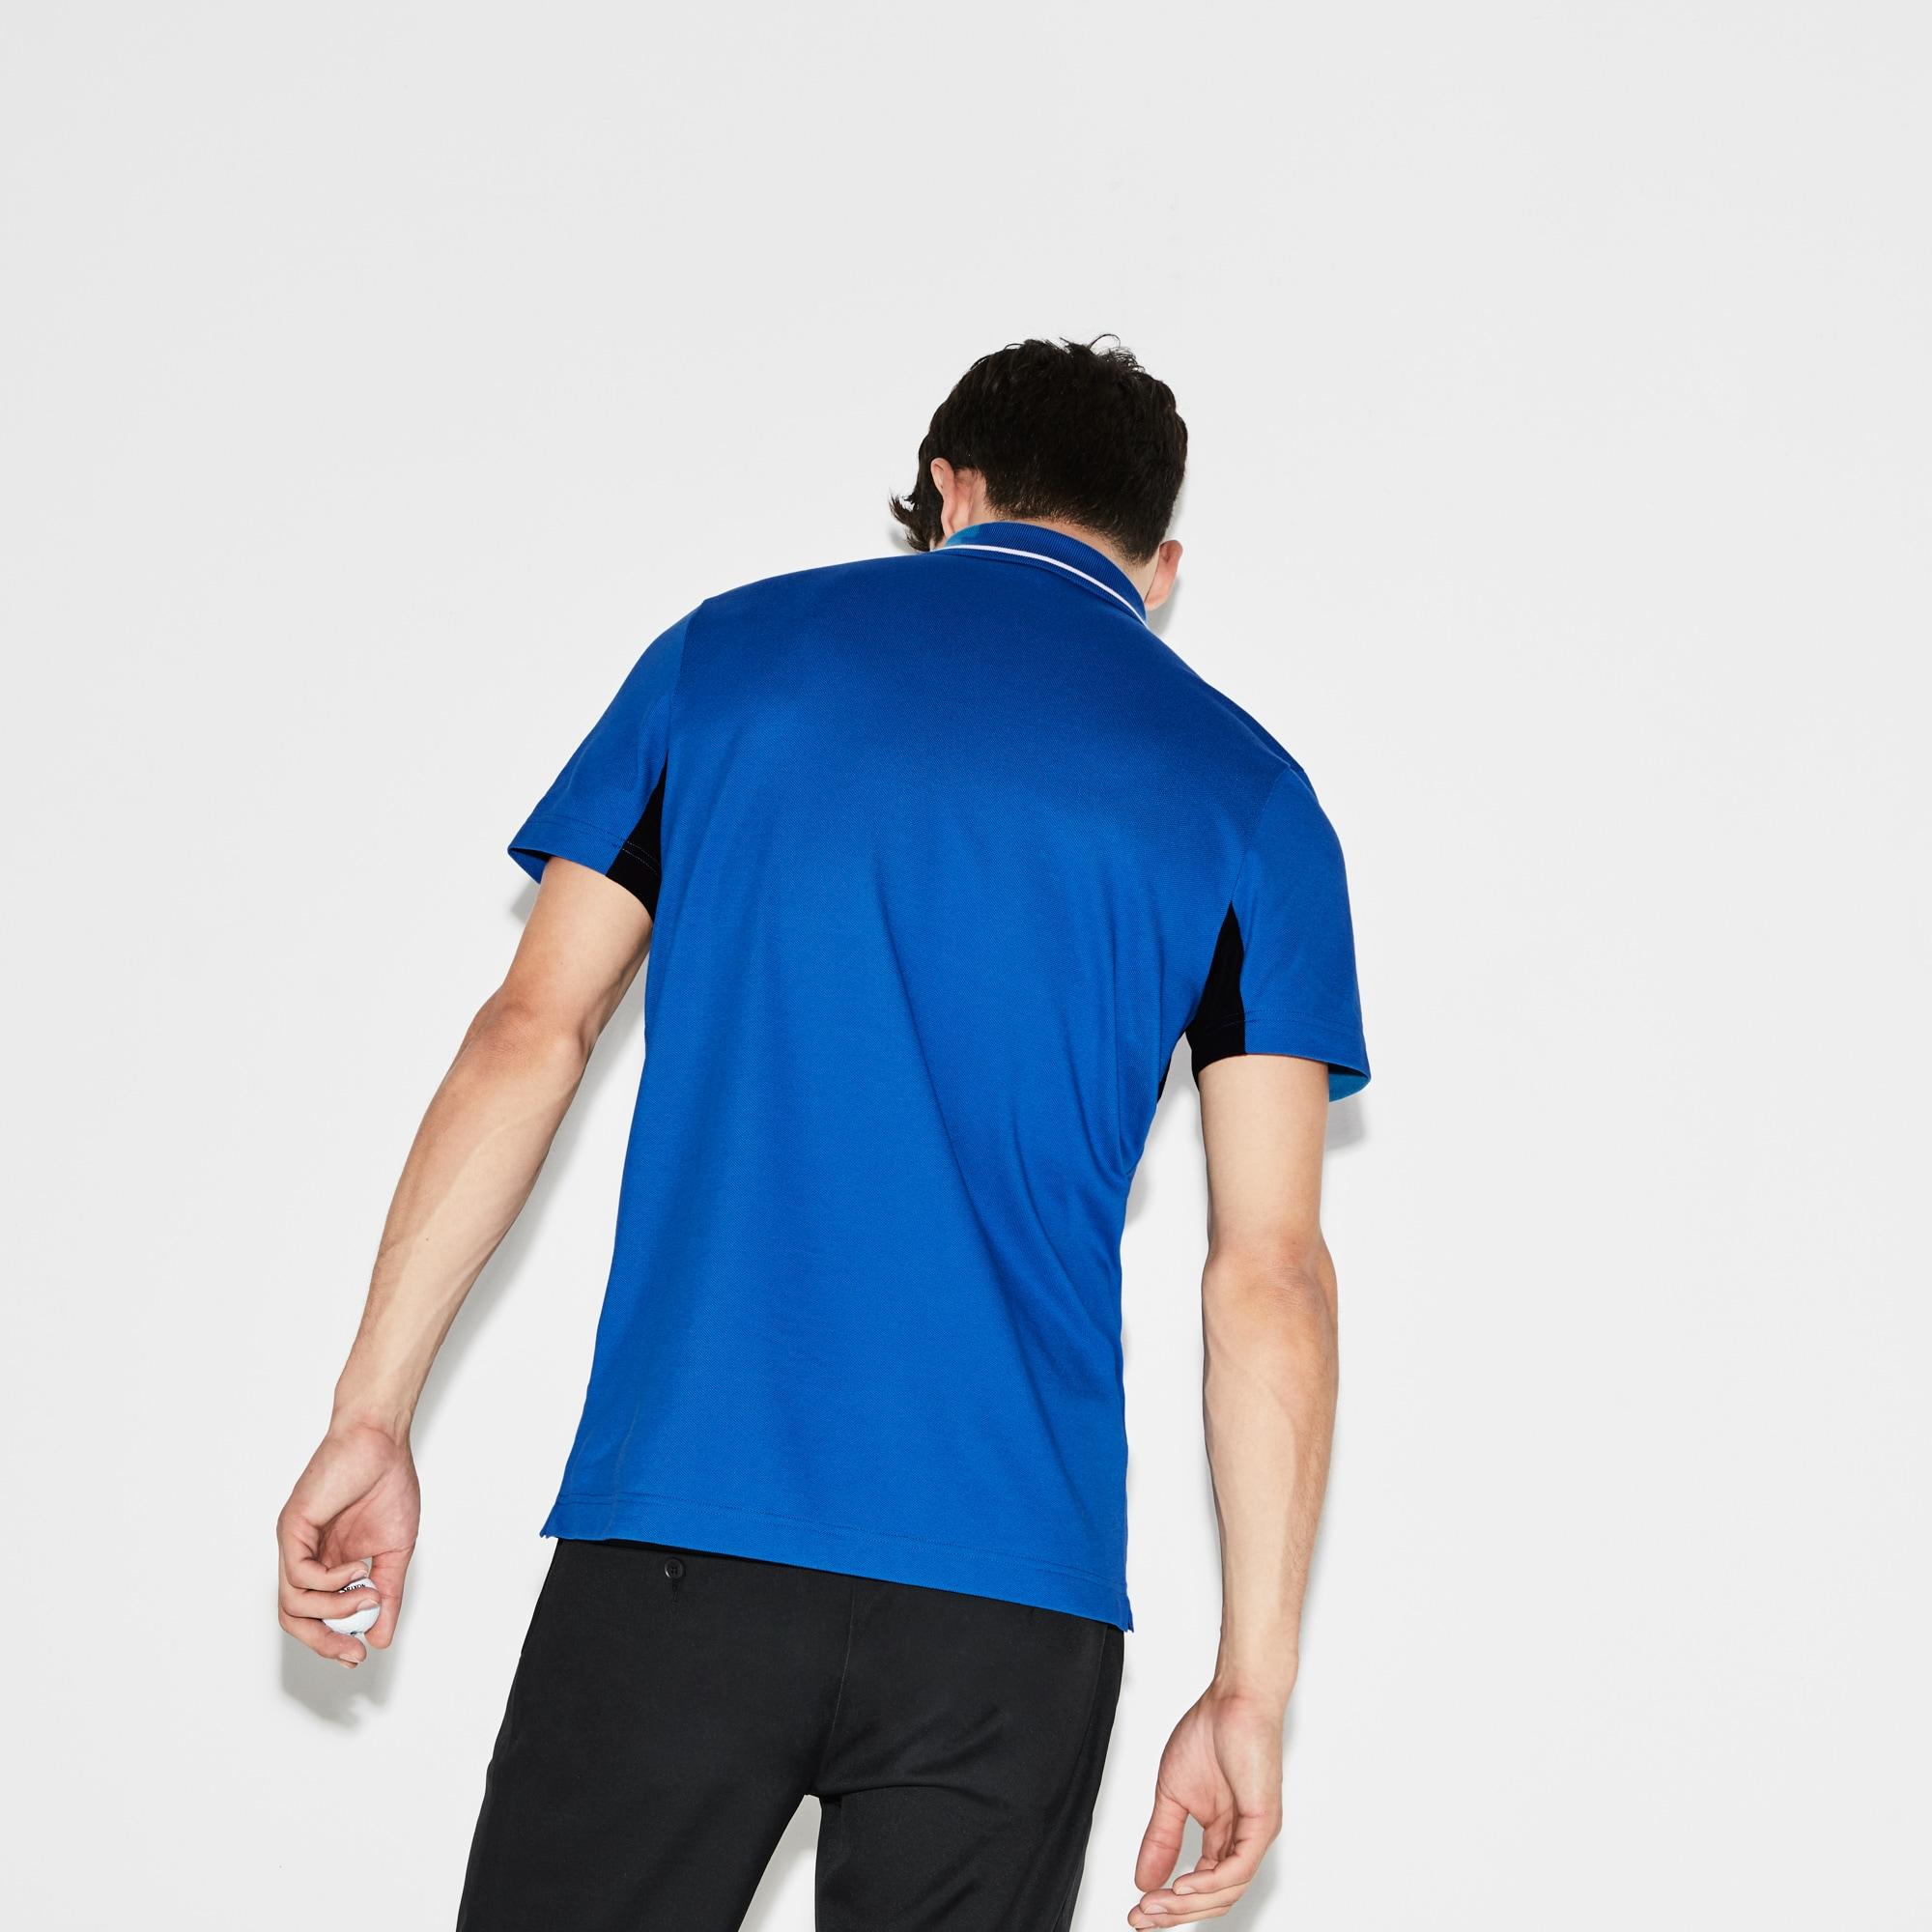 Lacoste - Herren LACOSTE SPORT Tennis-Poloshirt aus Funktionspiqué - 3